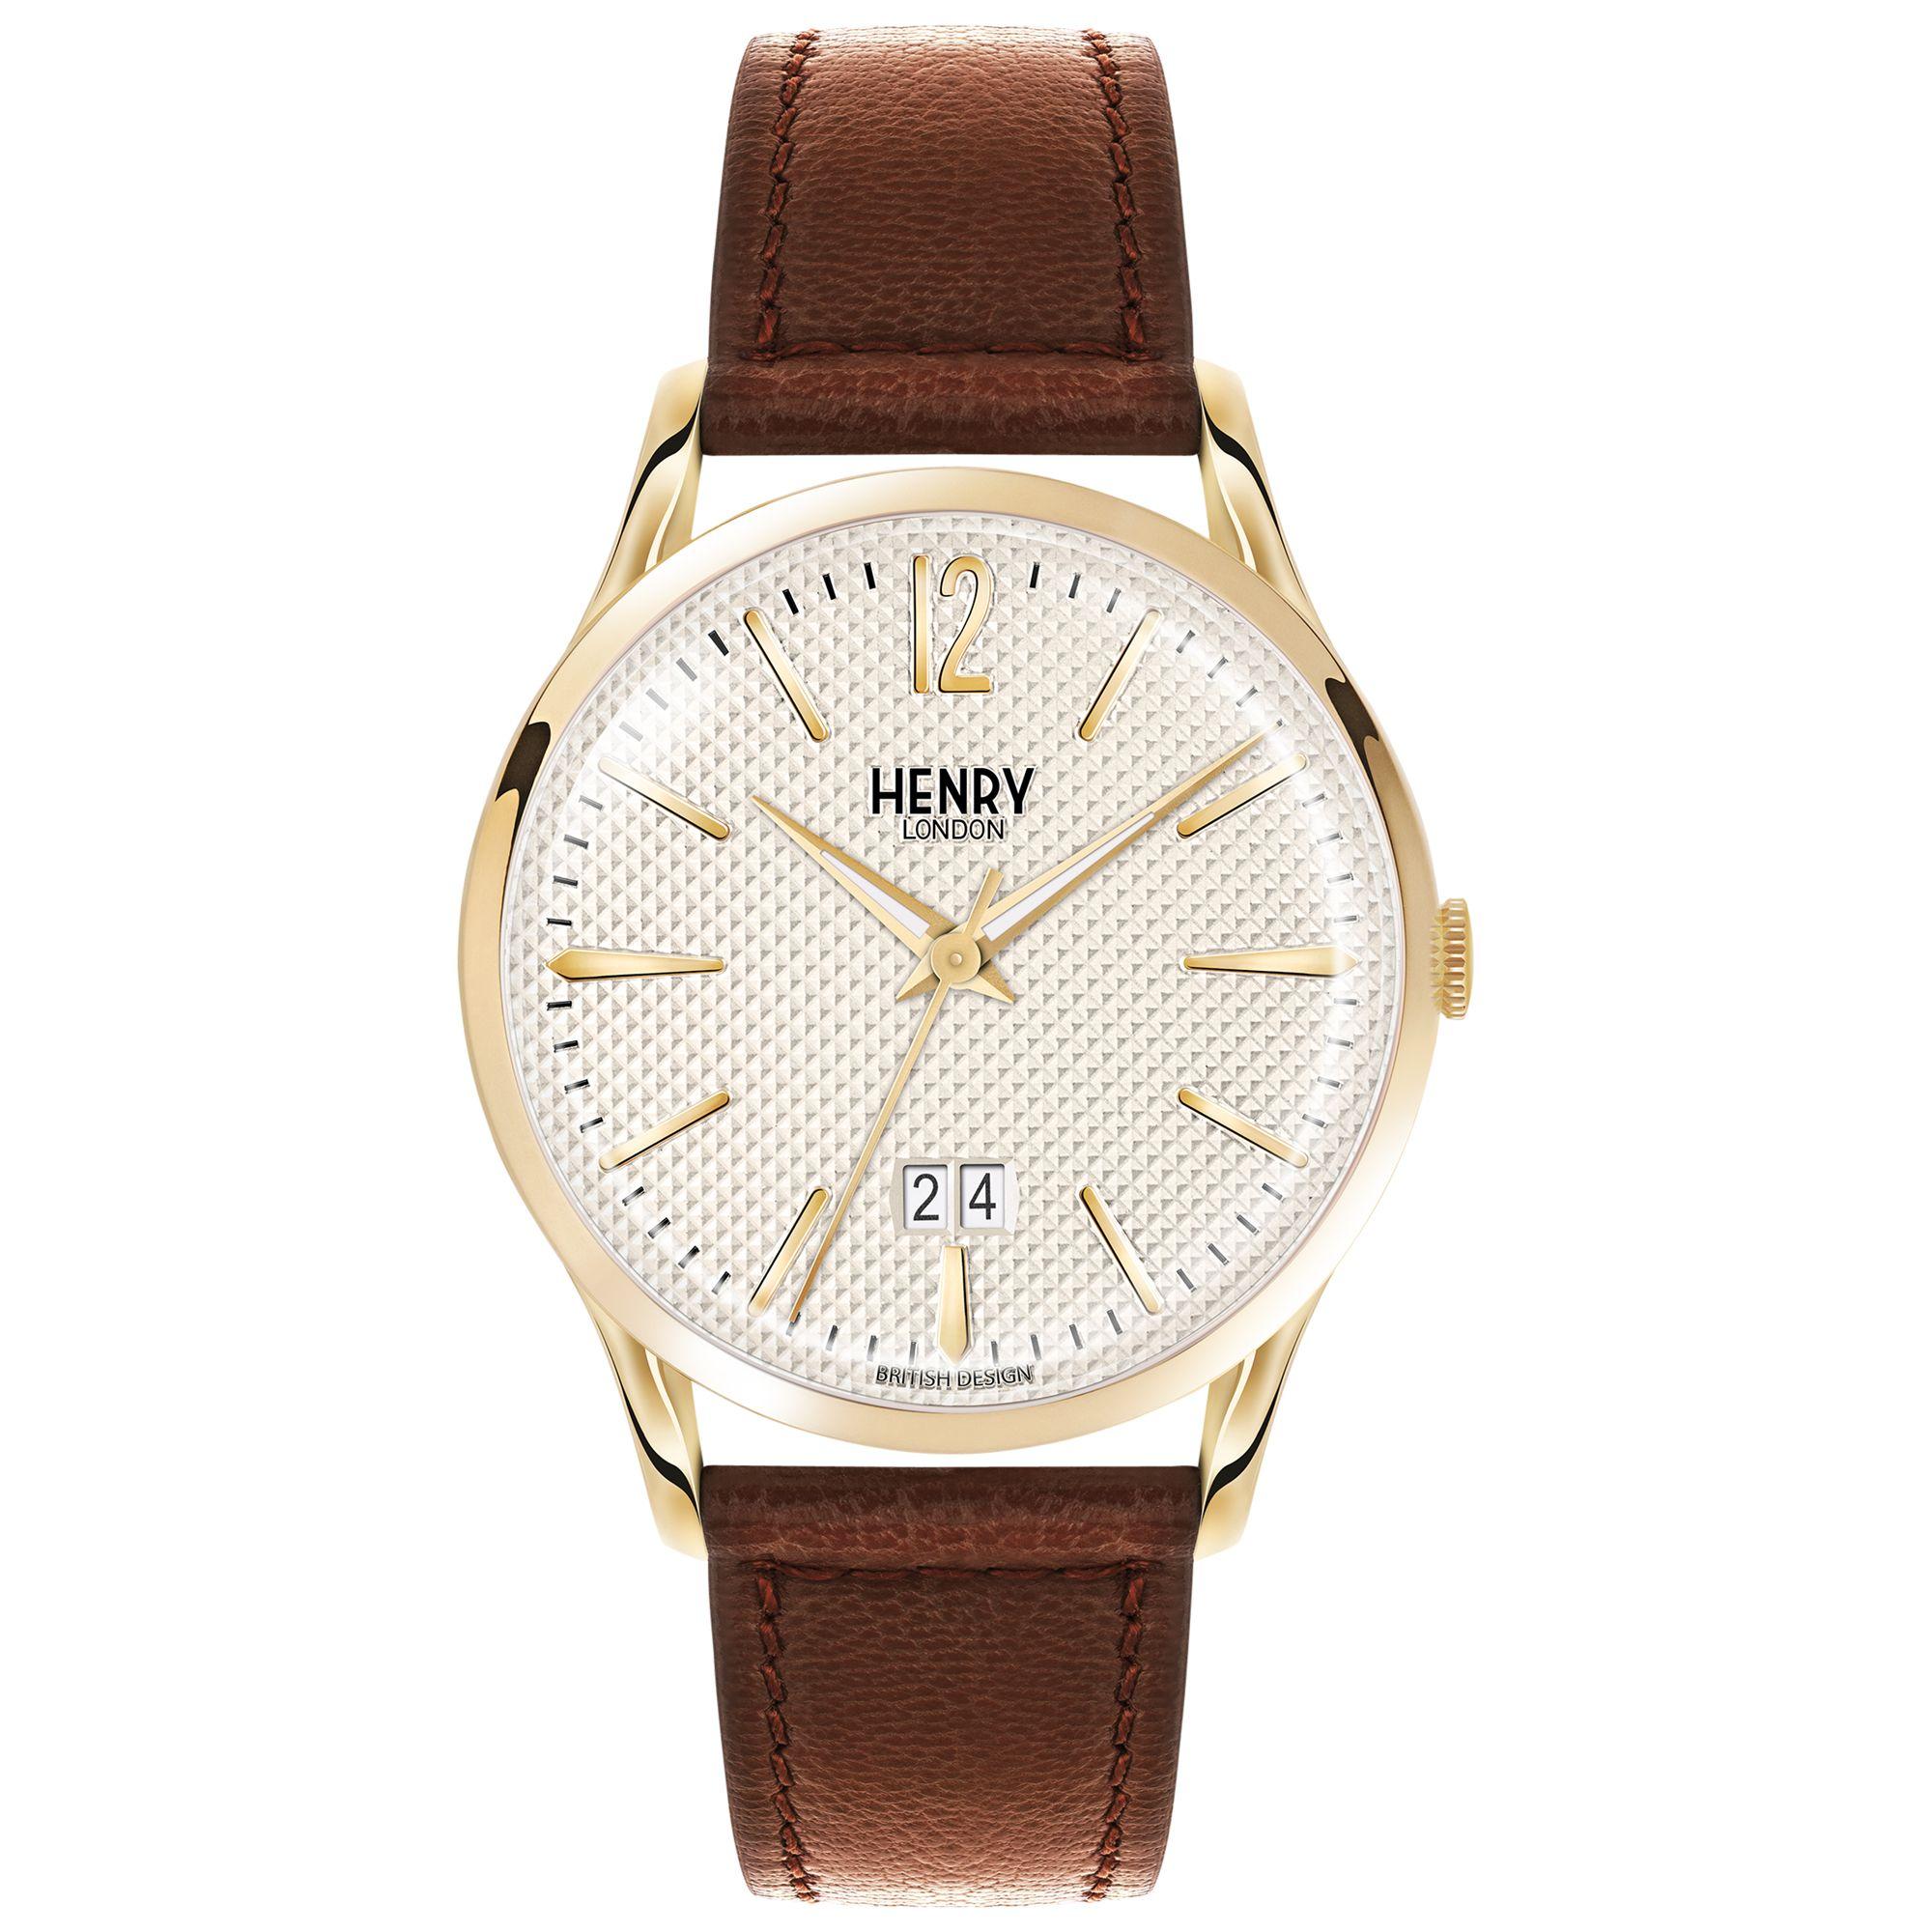 Henry London Henry London HL41-JS-0016 Men's Westminster Jumbo Date Leather Strap Watch, Brown/Cream